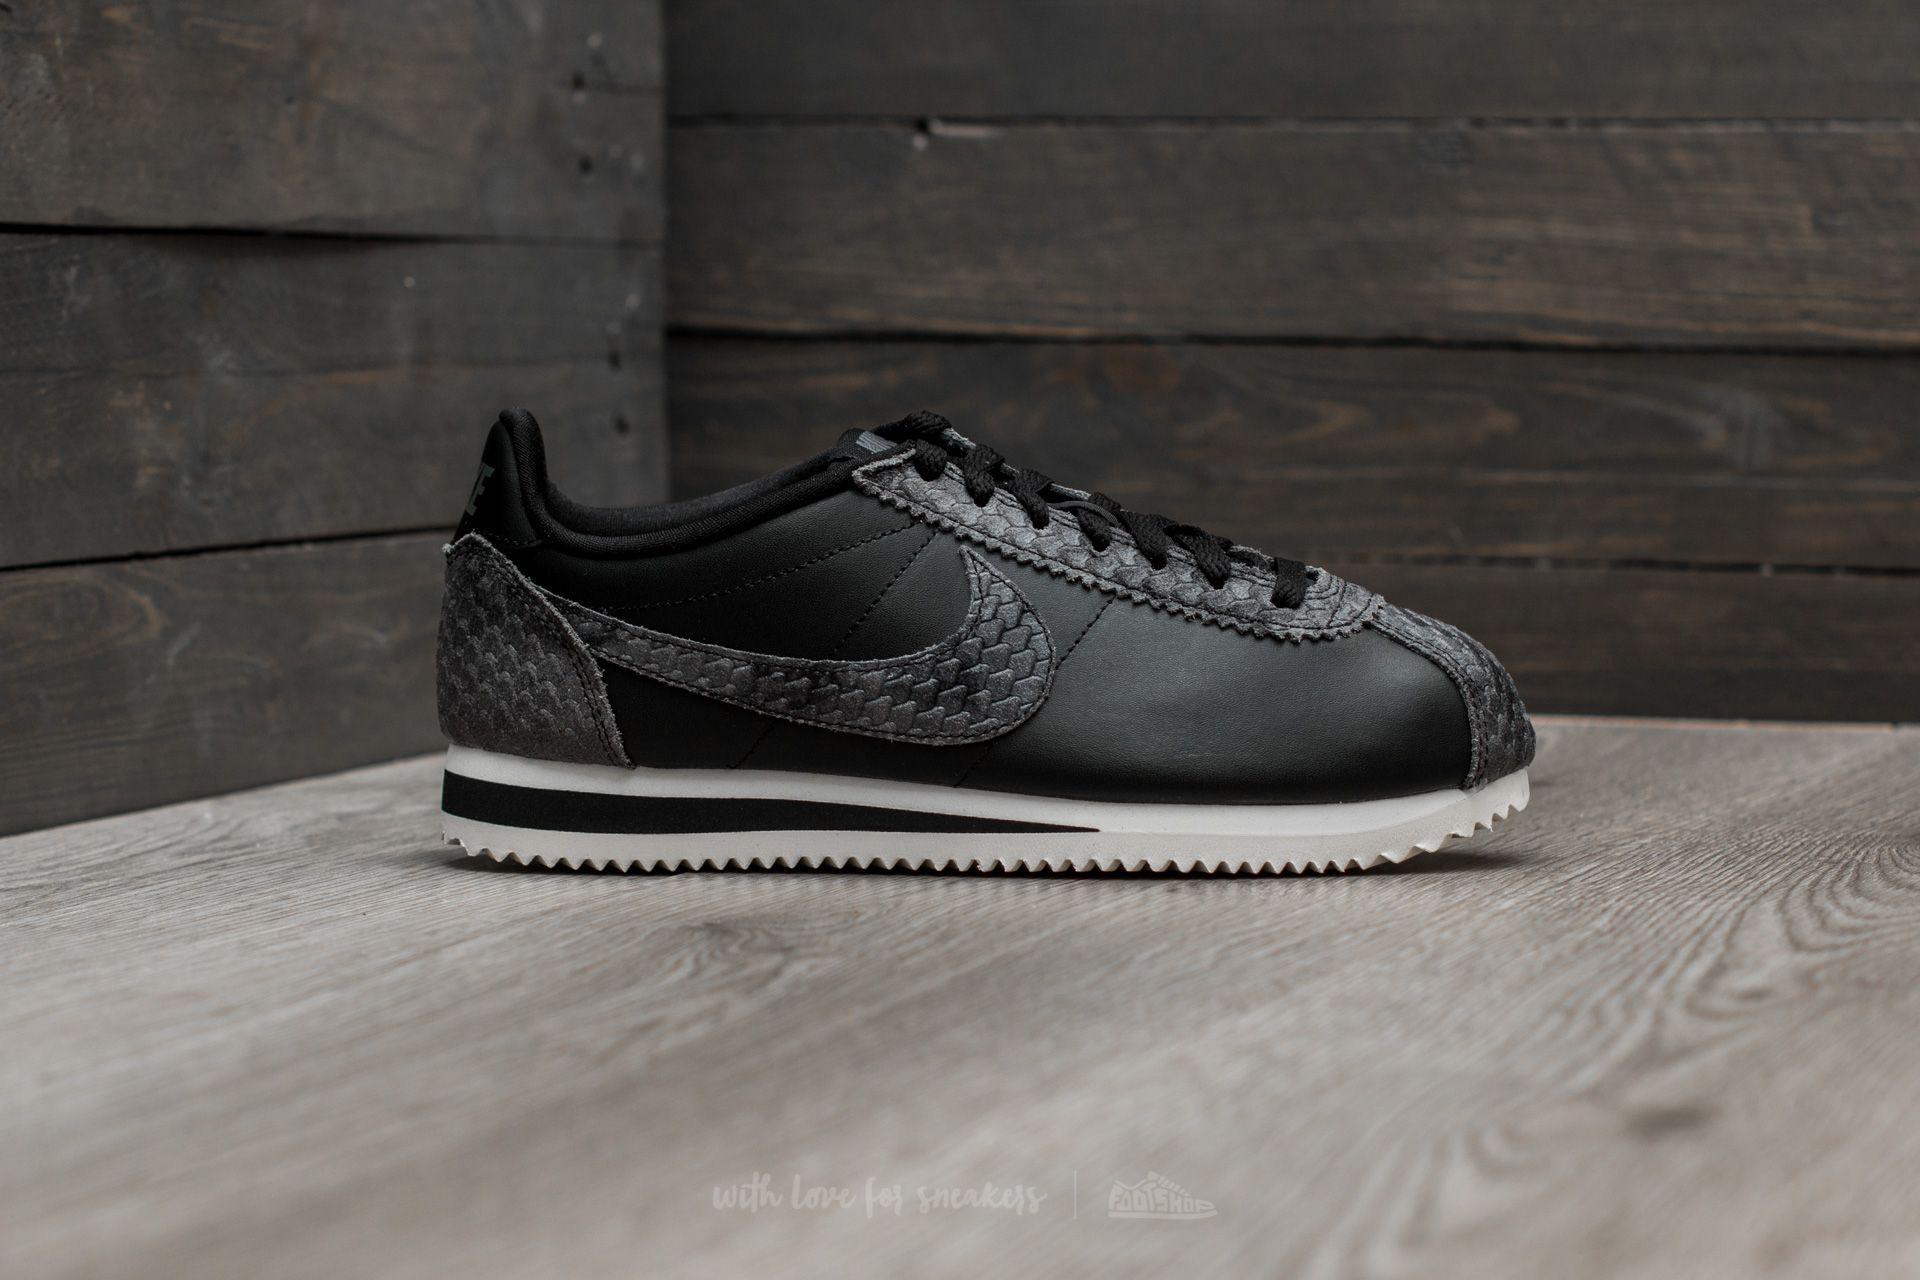 ab8c203462a4 Lyst - Nike Wmns Classic Cortez Premium Black  Black-sail in Black